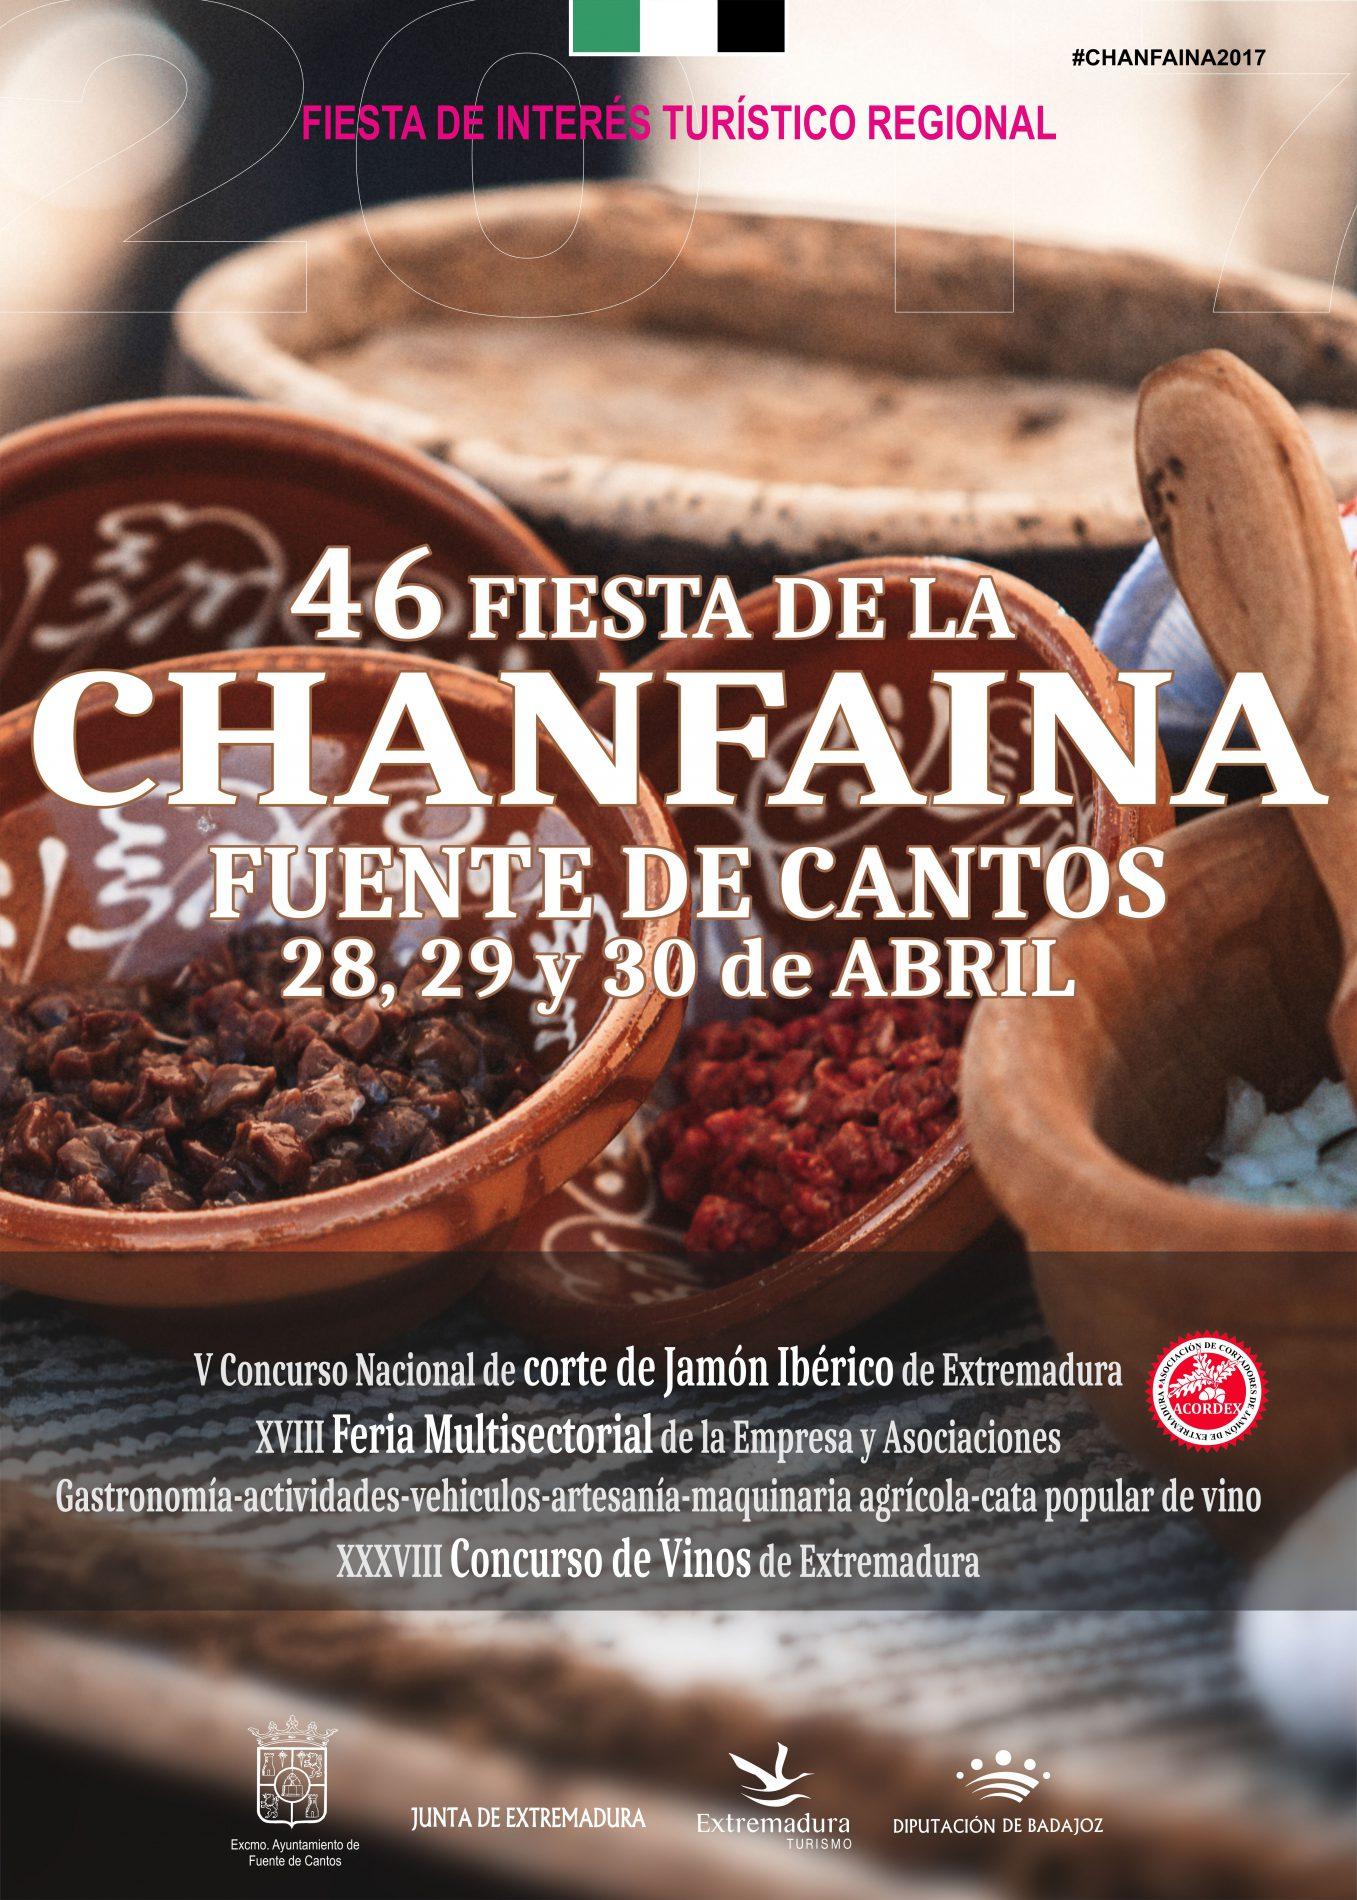 chanfaina 2017